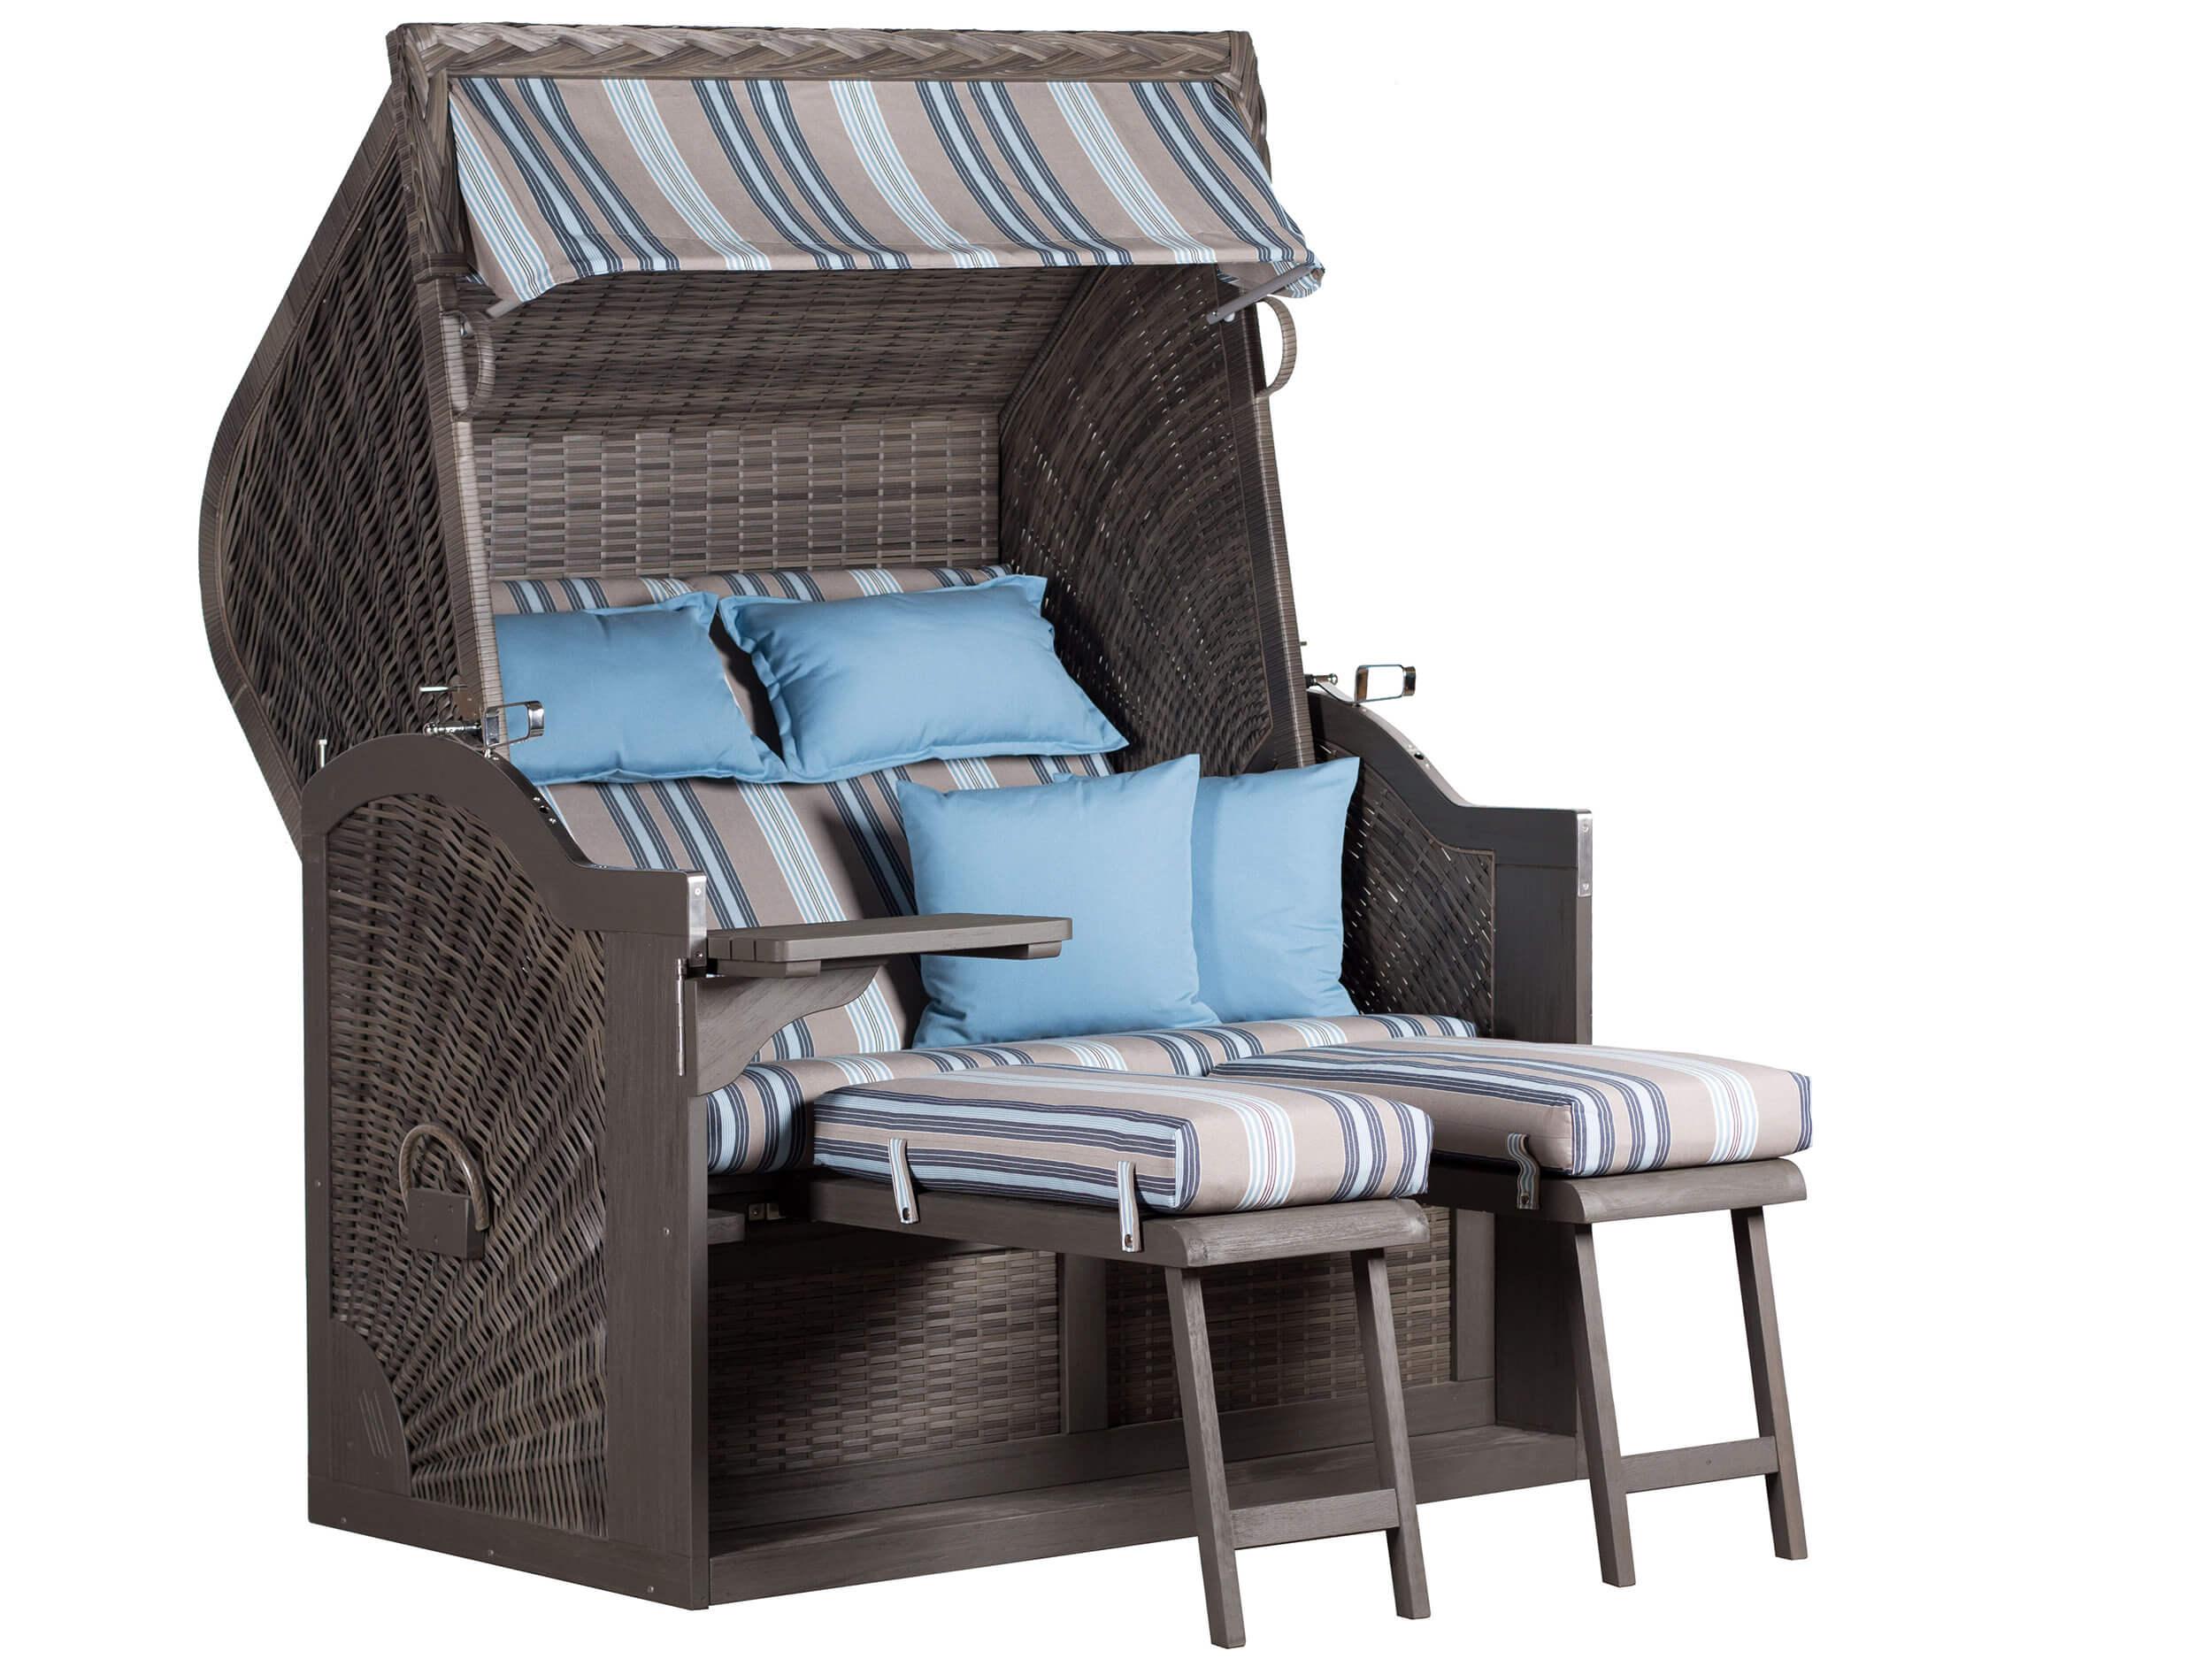 devries strandkorb pure baltic xl grau dessin 104 gartenm bel l nse. Black Bedroom Furniture Sets. Home Design Ideas